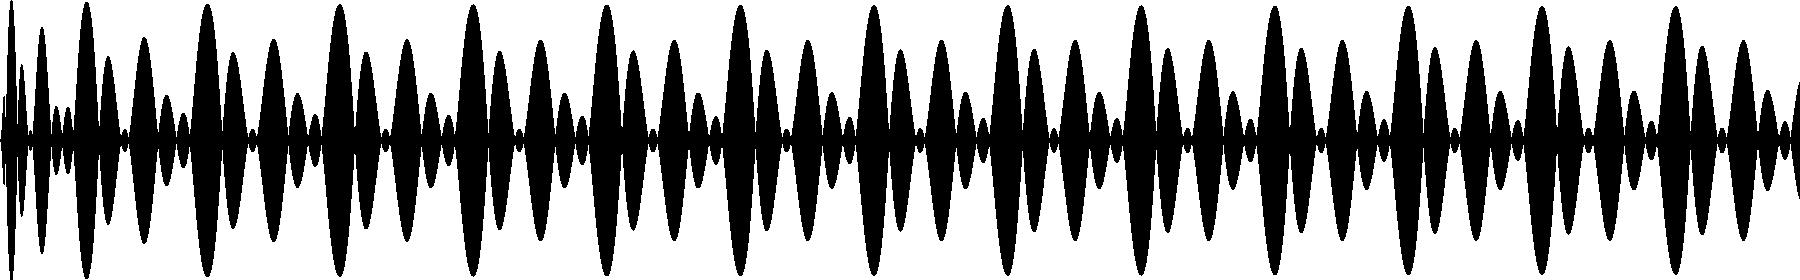 vedh bass cut 142 d